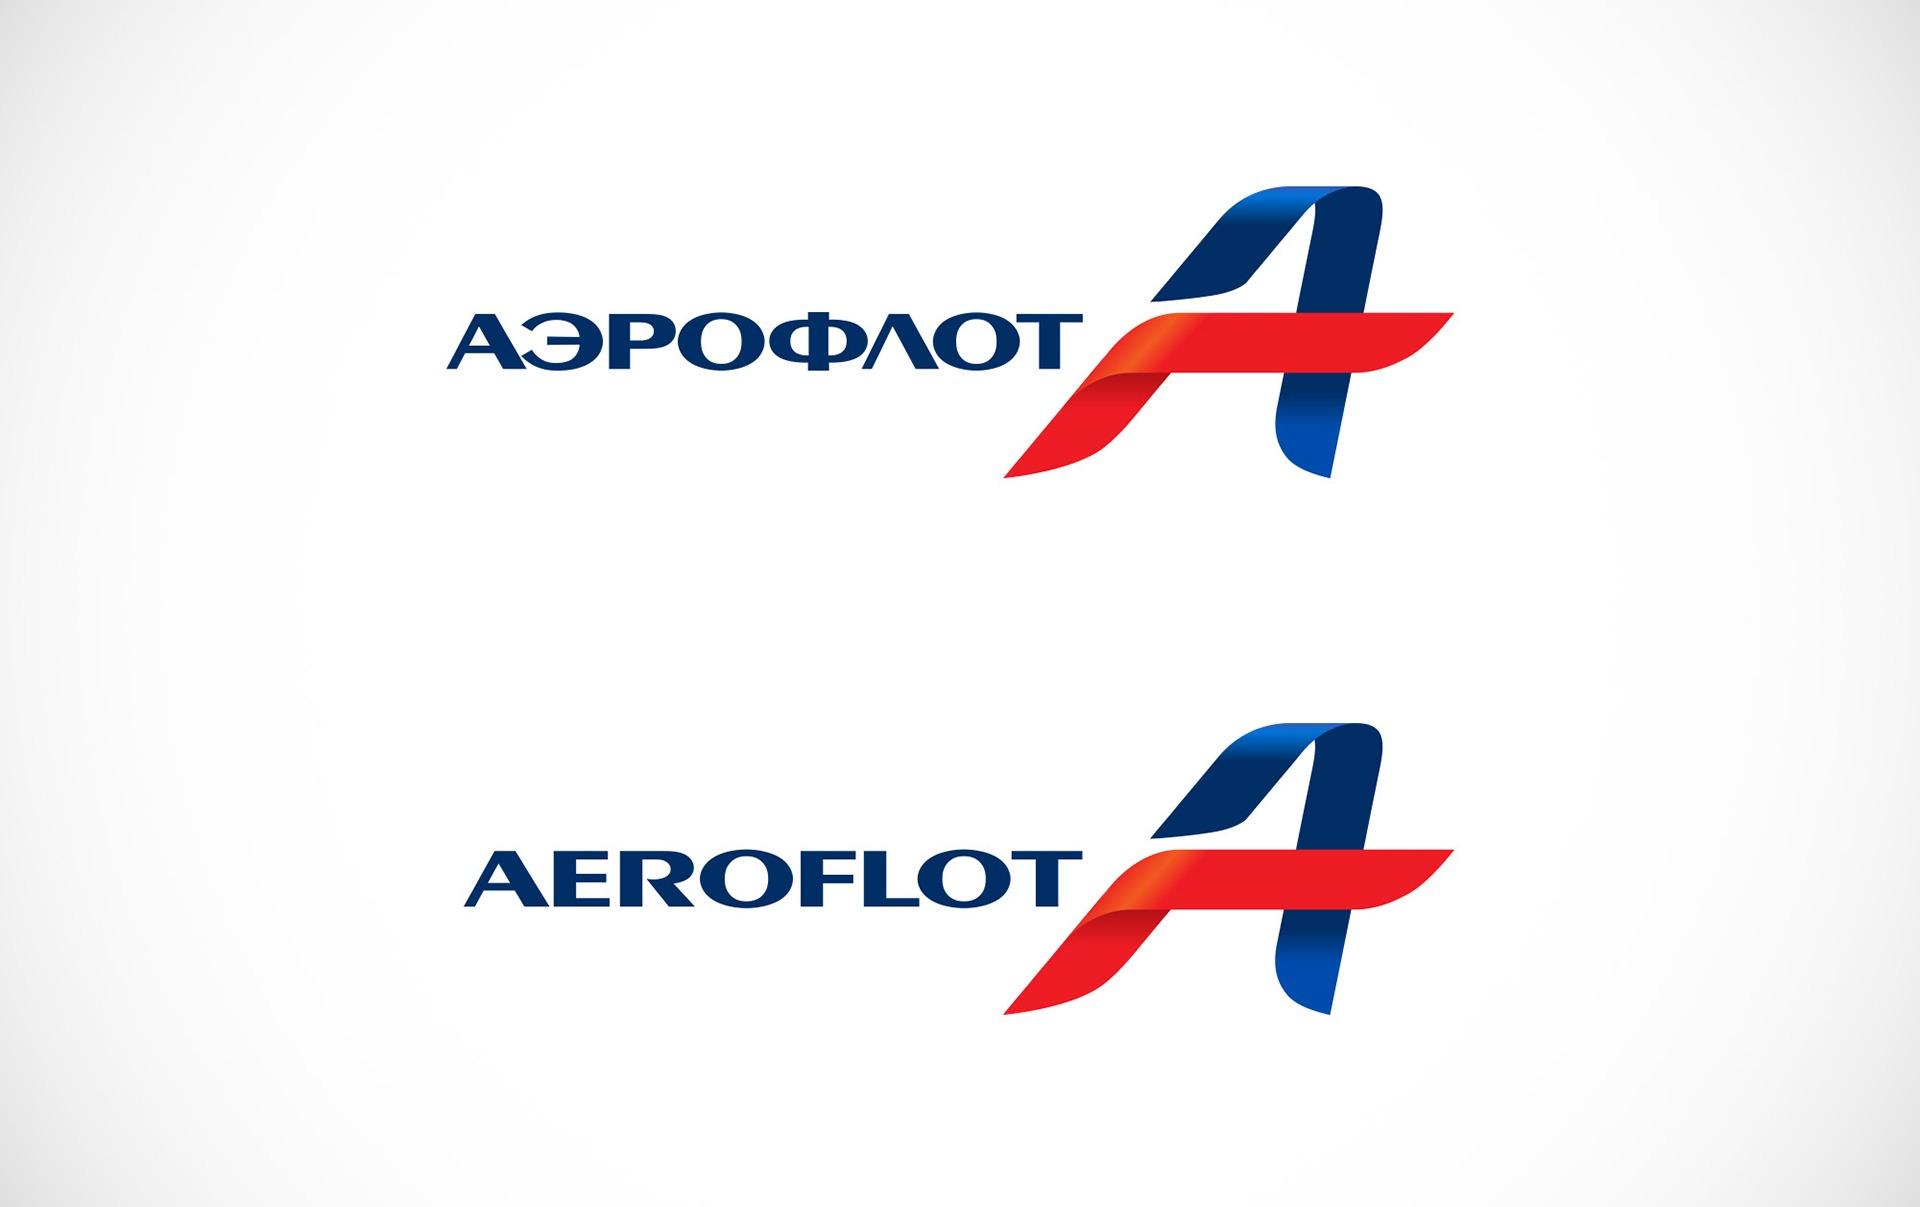 Фирменный стиль авиакомпании, Asgard Branding, лого Аэрофлот, Aeroflot, re-branding, ребрендинг авиакомпании